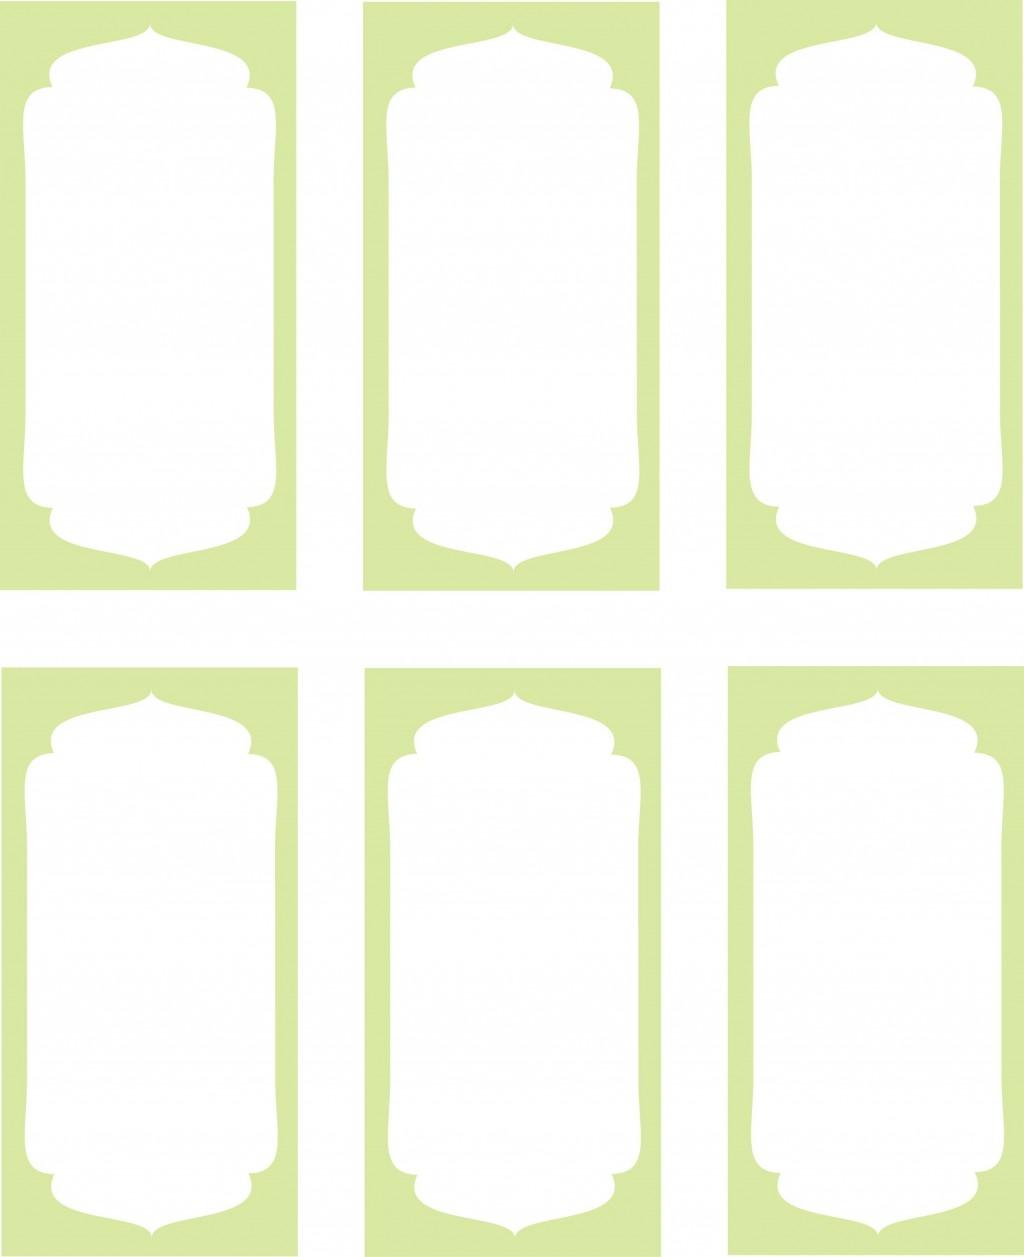 007 Stunning Free Printable Return Addres Label Template High Def  Templates ChristmaLarge